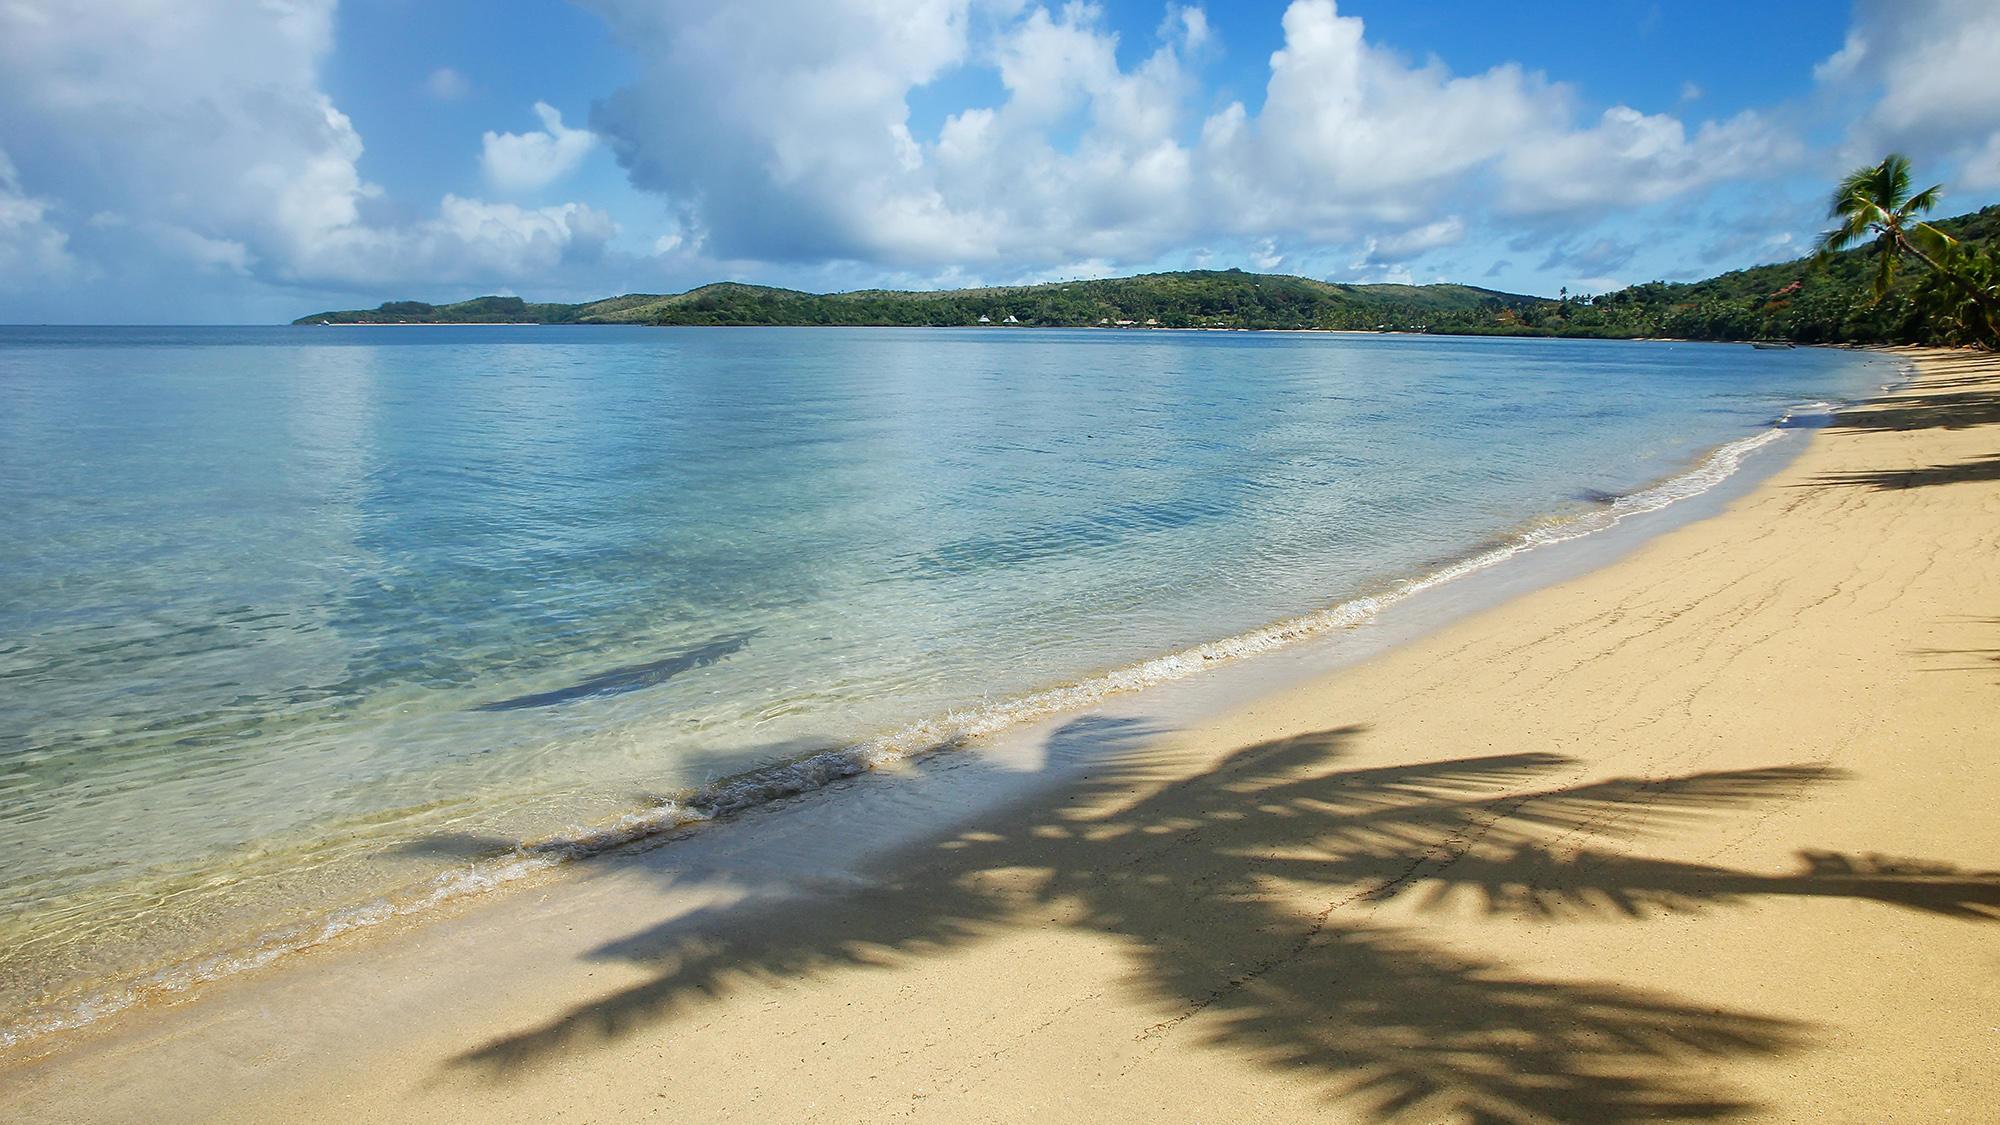 fiji sand beach